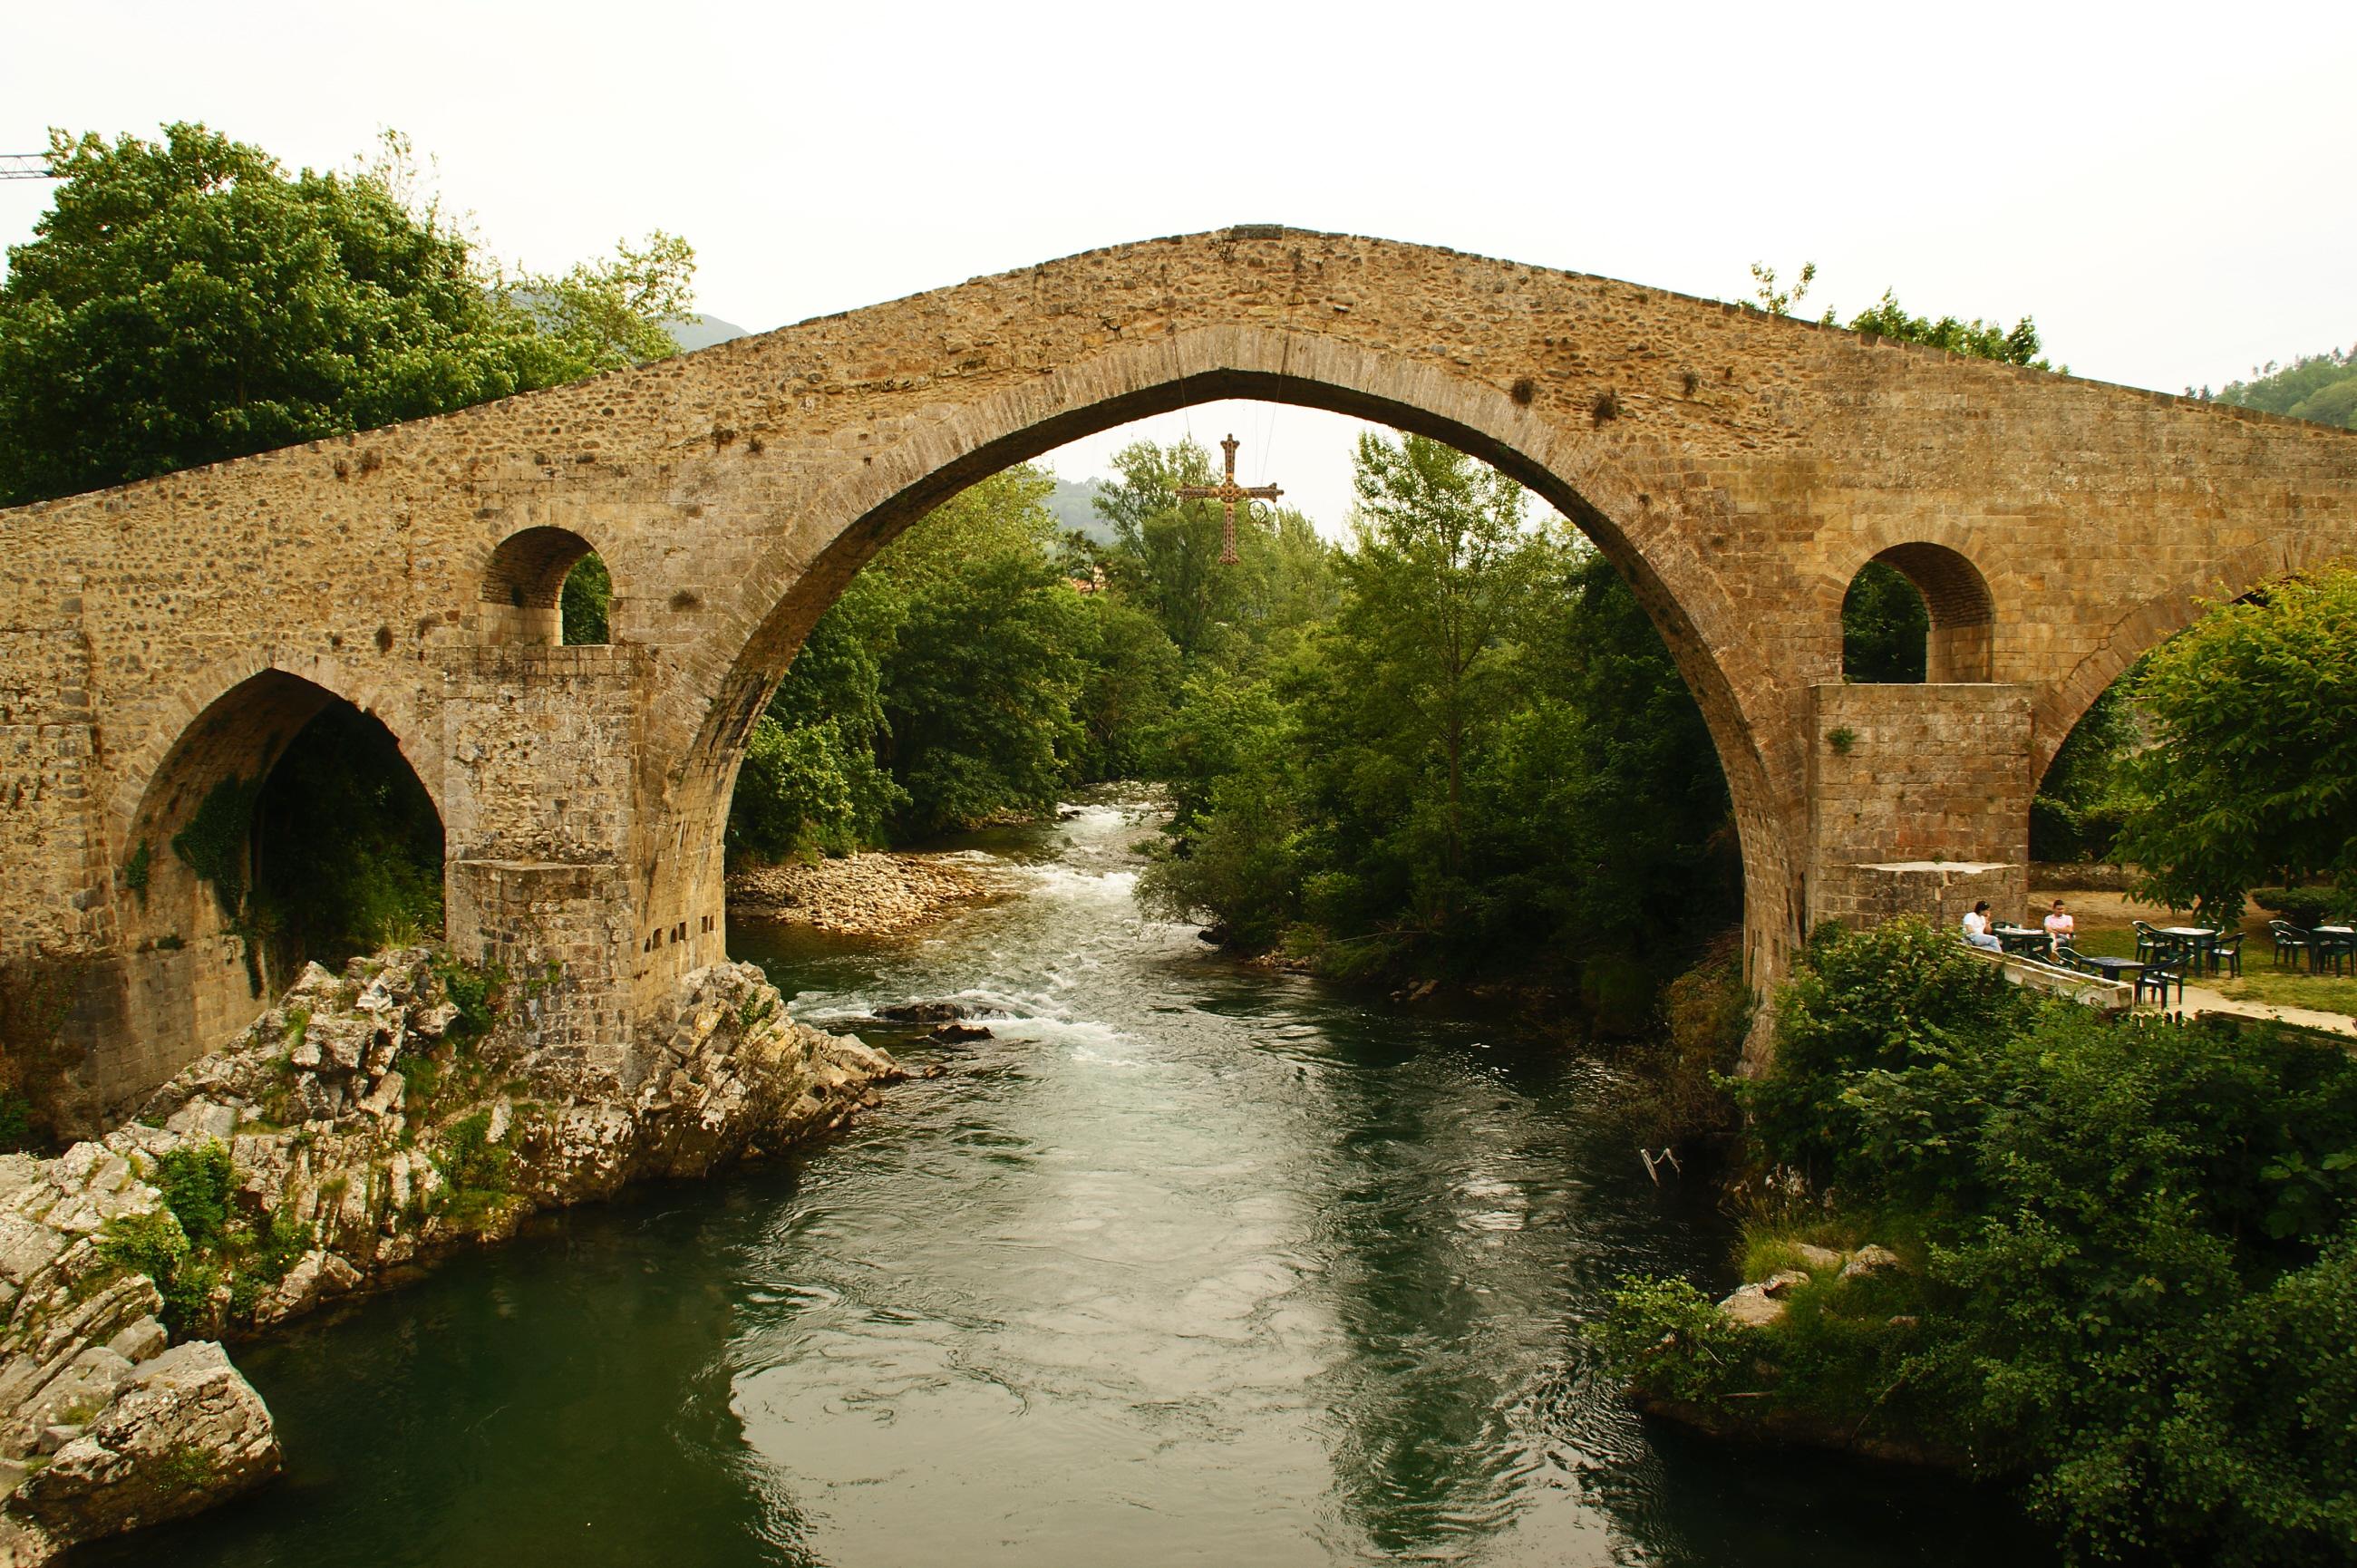 wikimedia org wikipedia commons 0 00 Roman bridge at Cangas 1 comRoman Bridges